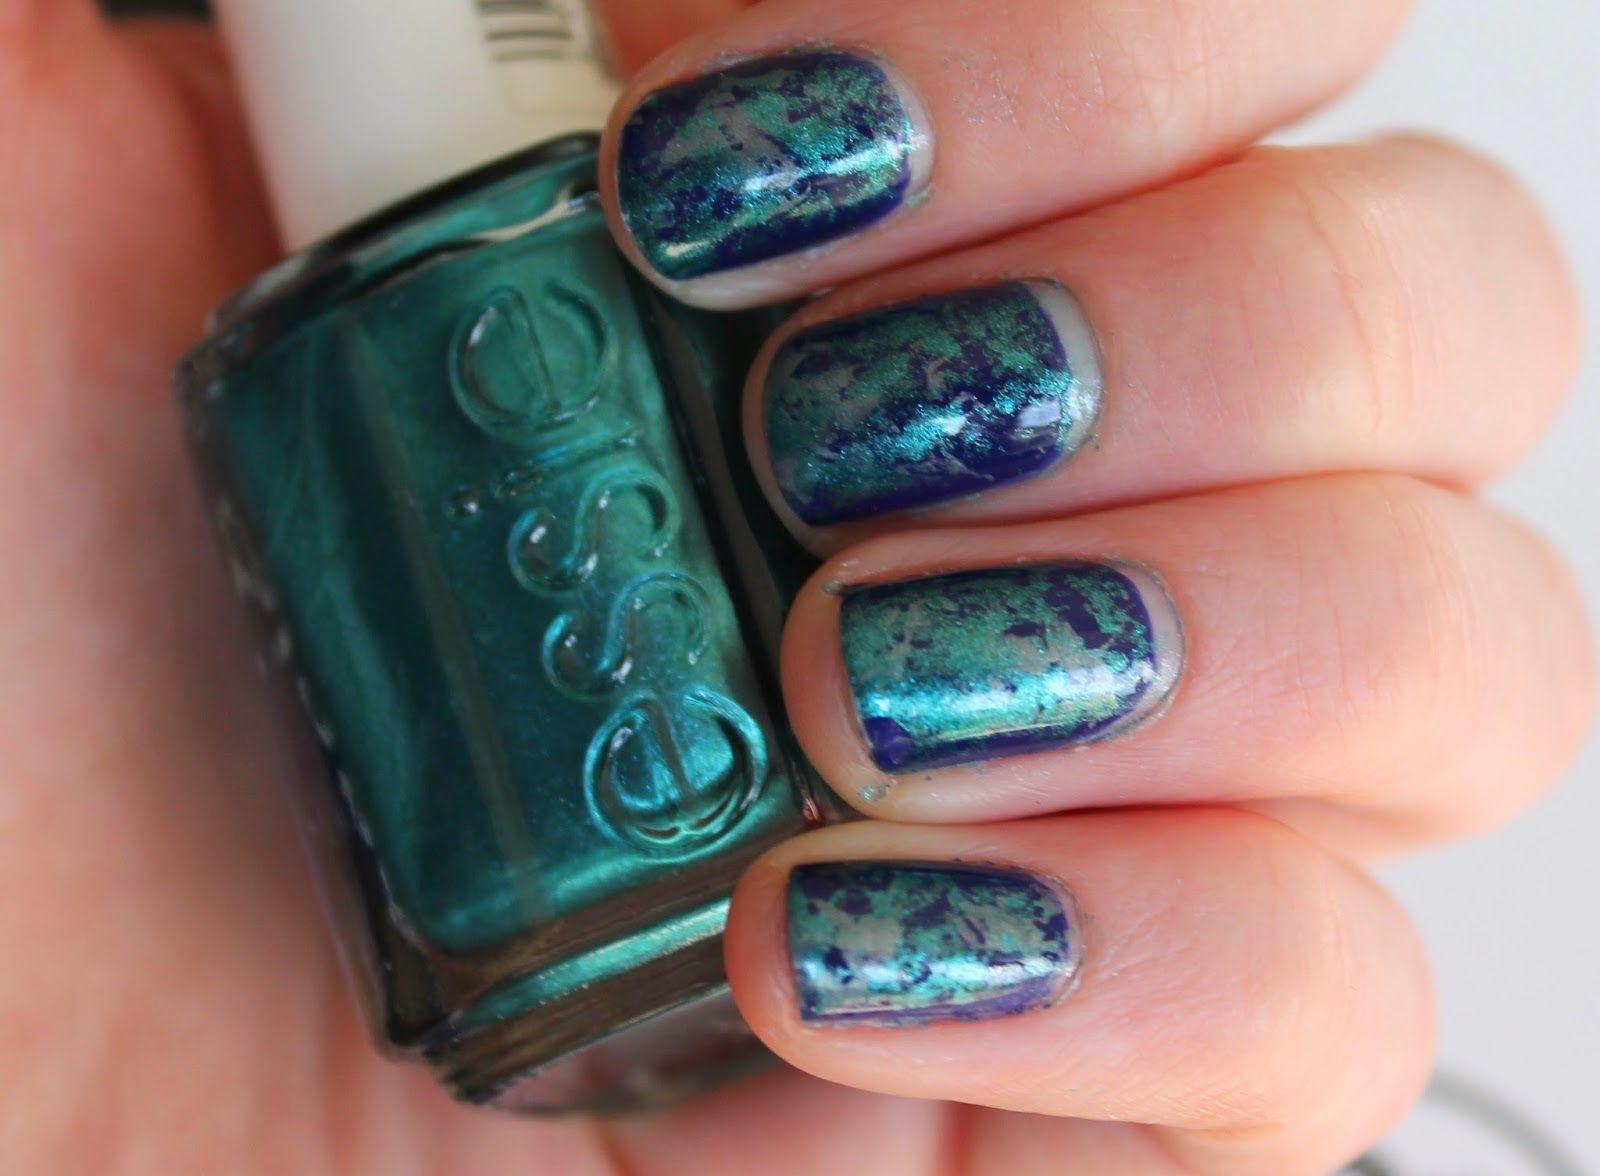 Cling film nail art tutorial. Blue, green, silver, shimmer. OPI ...